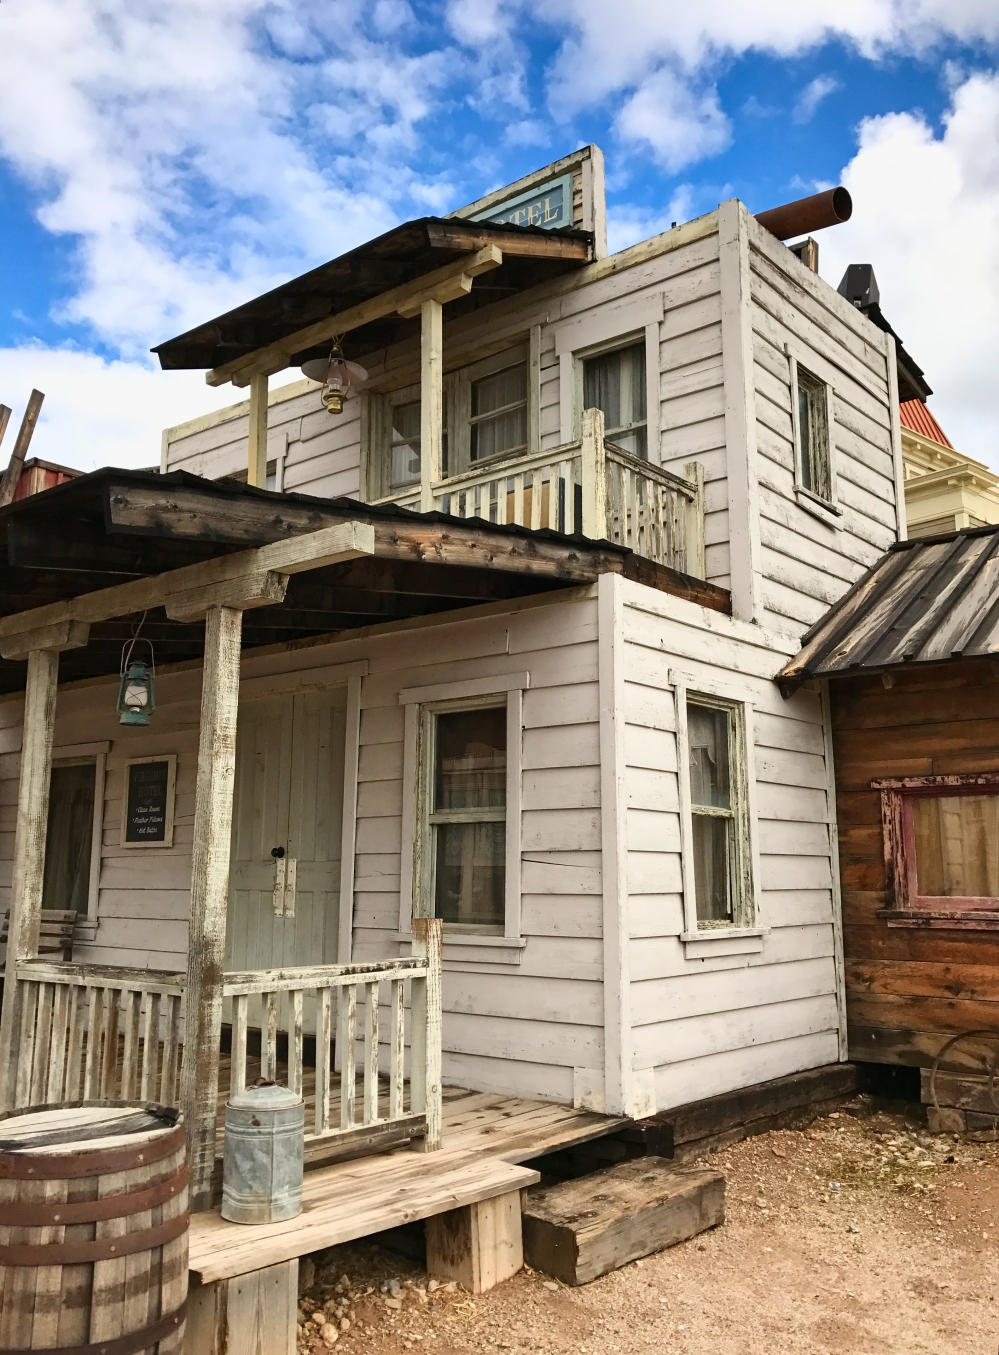 Old Tucson old bldg